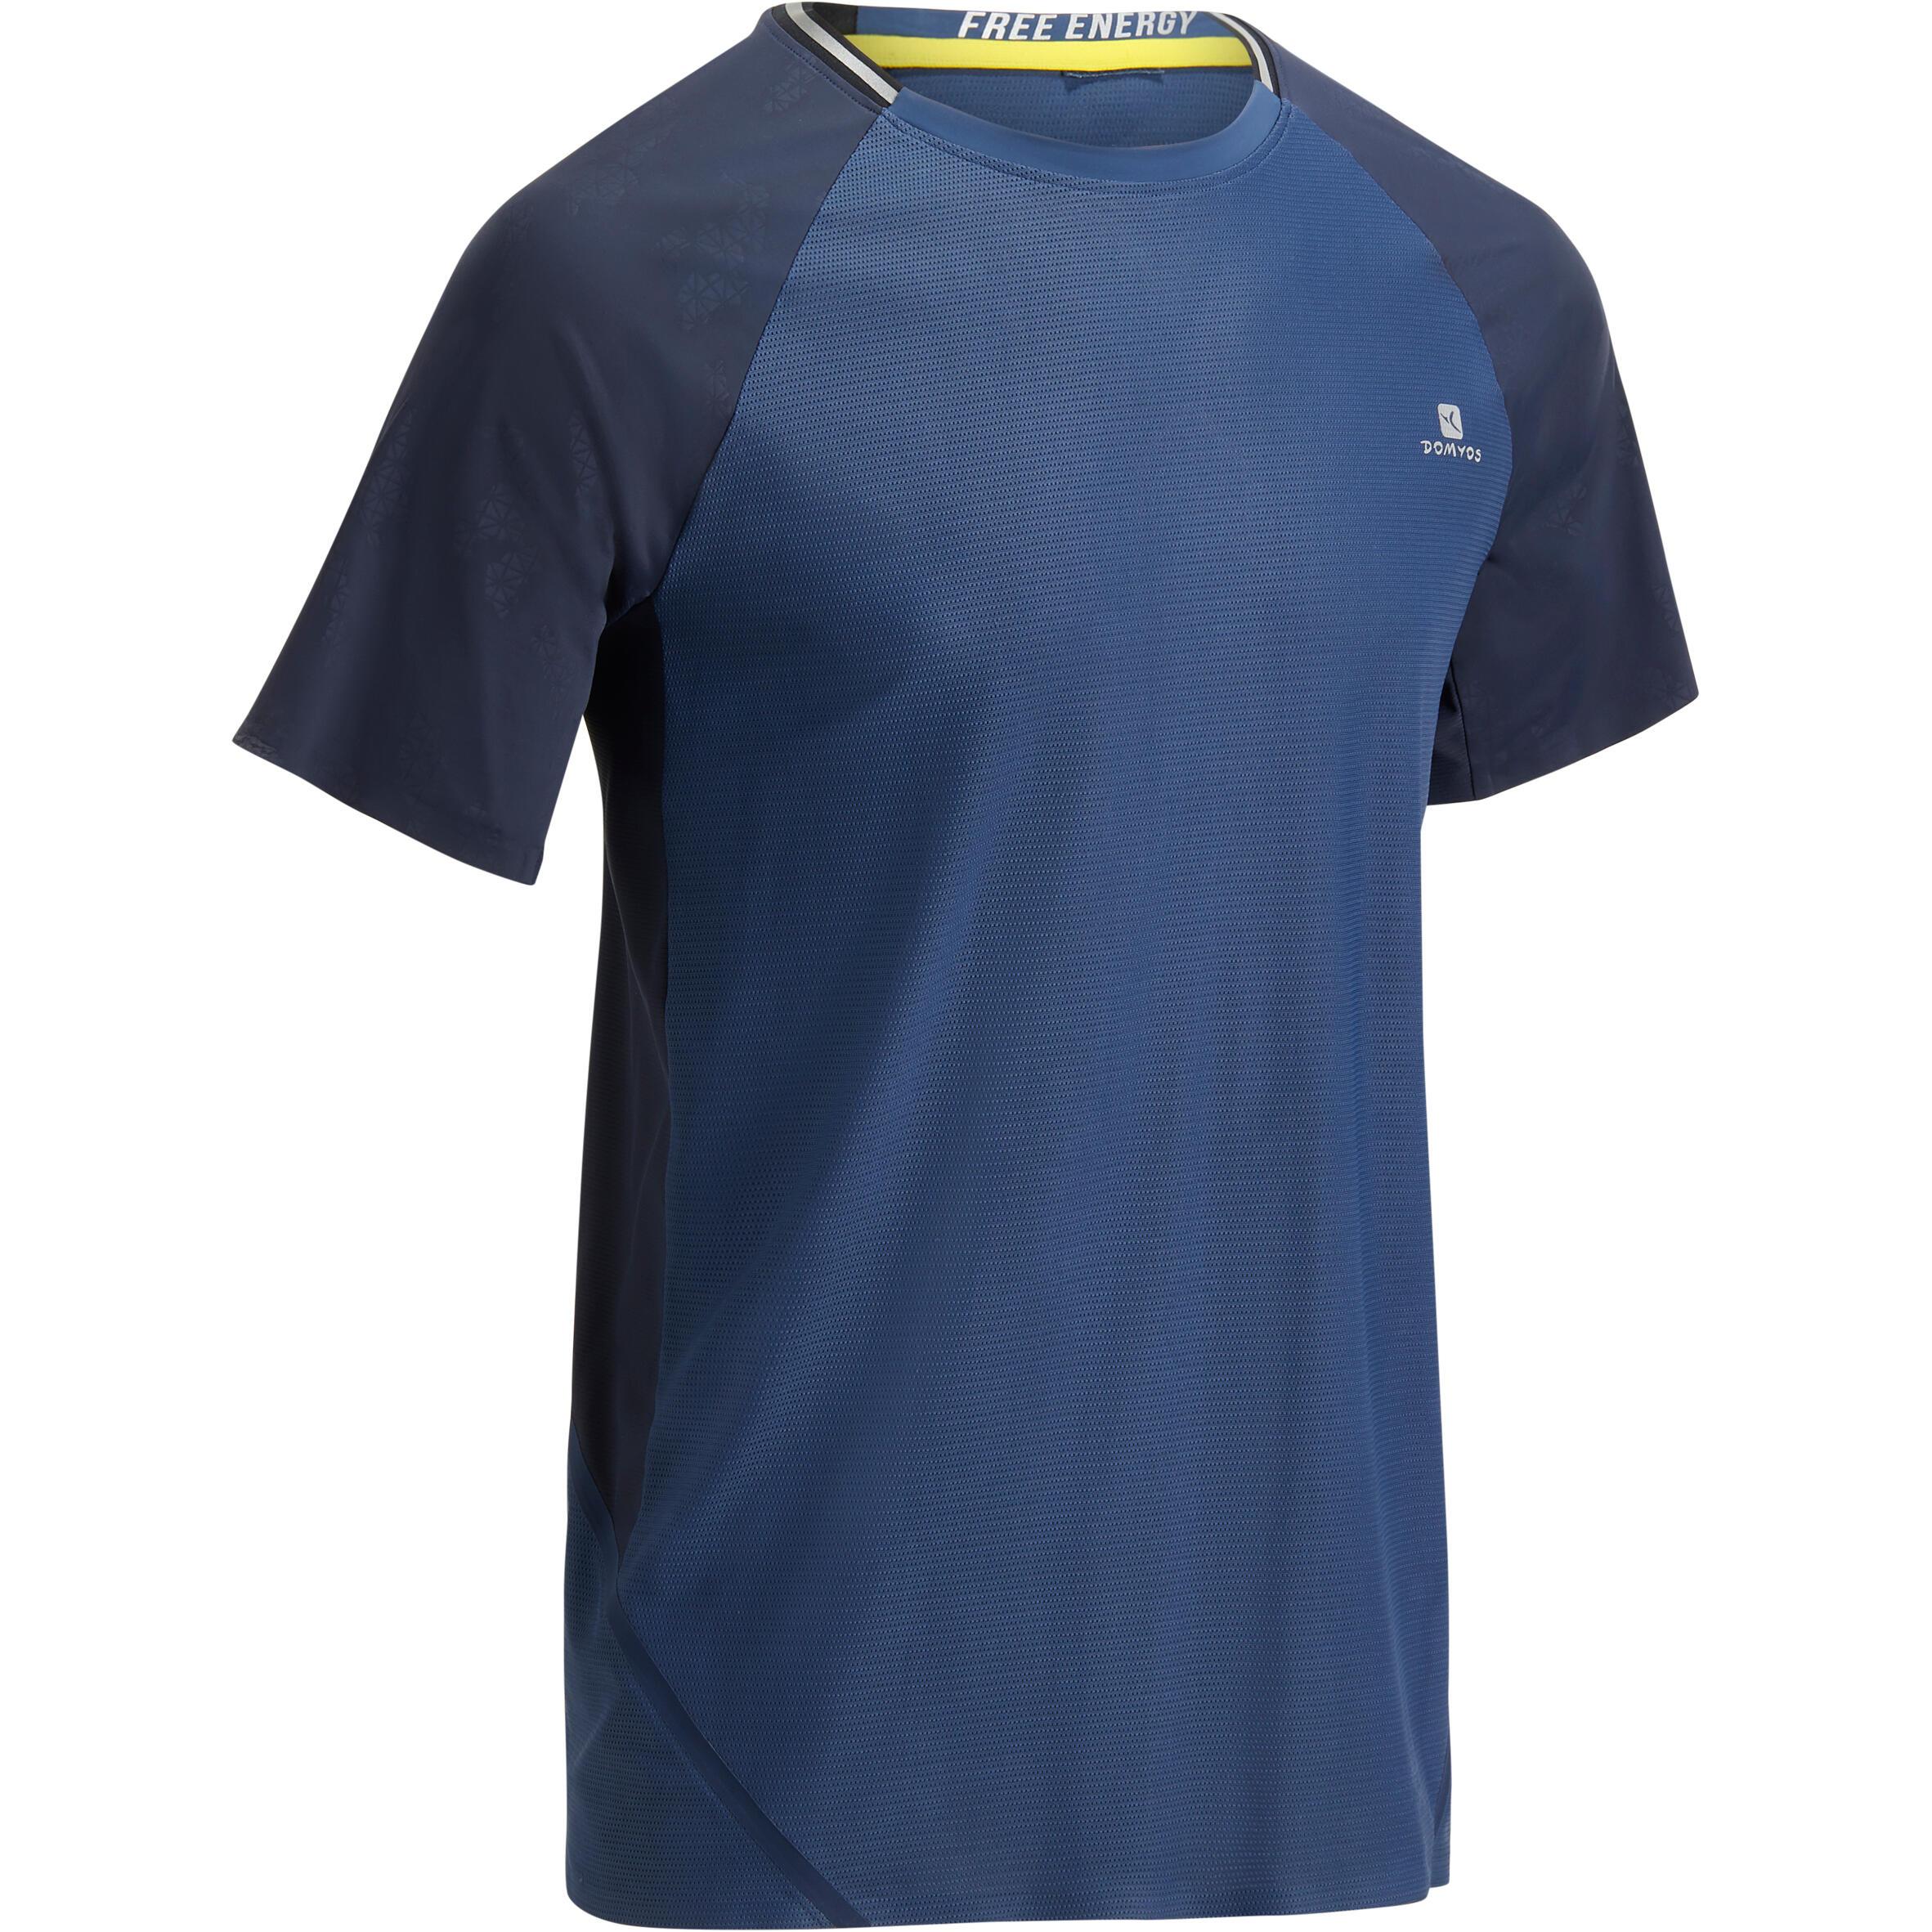 Domyos T-shirt fitness cardio heren lichtgrijs FTS920